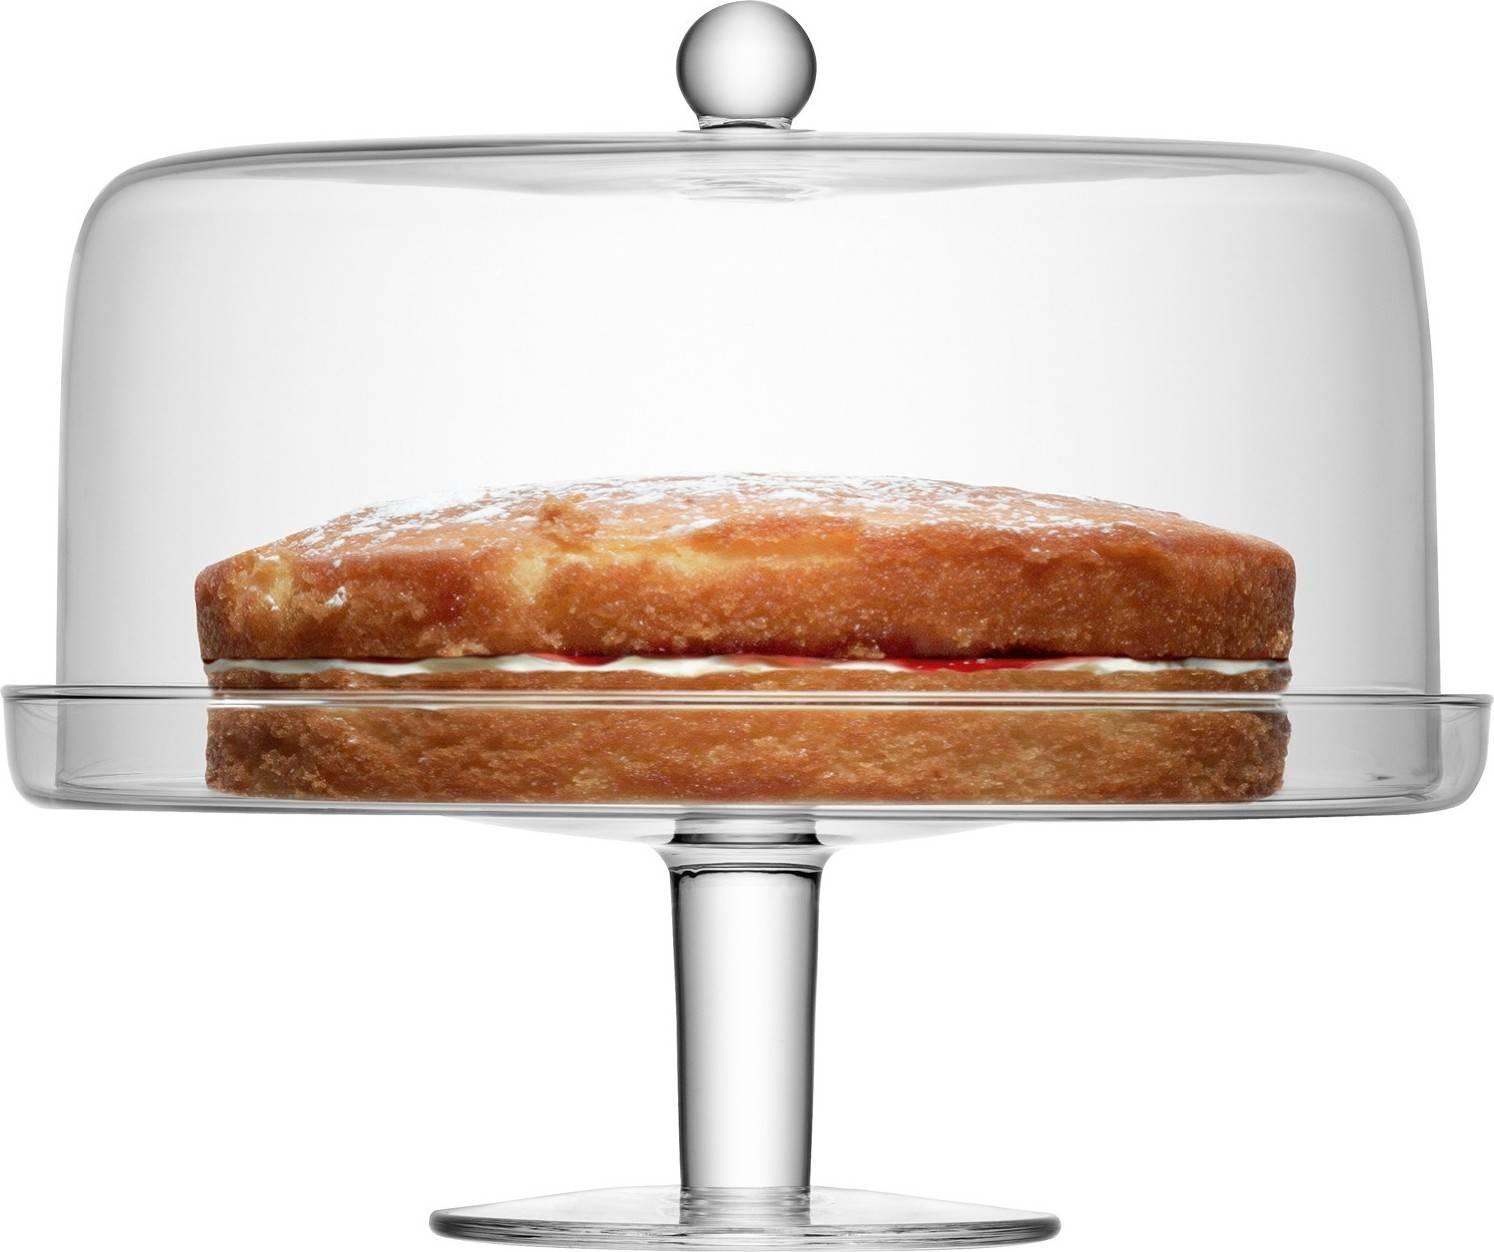 LSA Klara stojan na dorty s poklopem, průměr 33cm, Handmade G914-33-301 LSA International